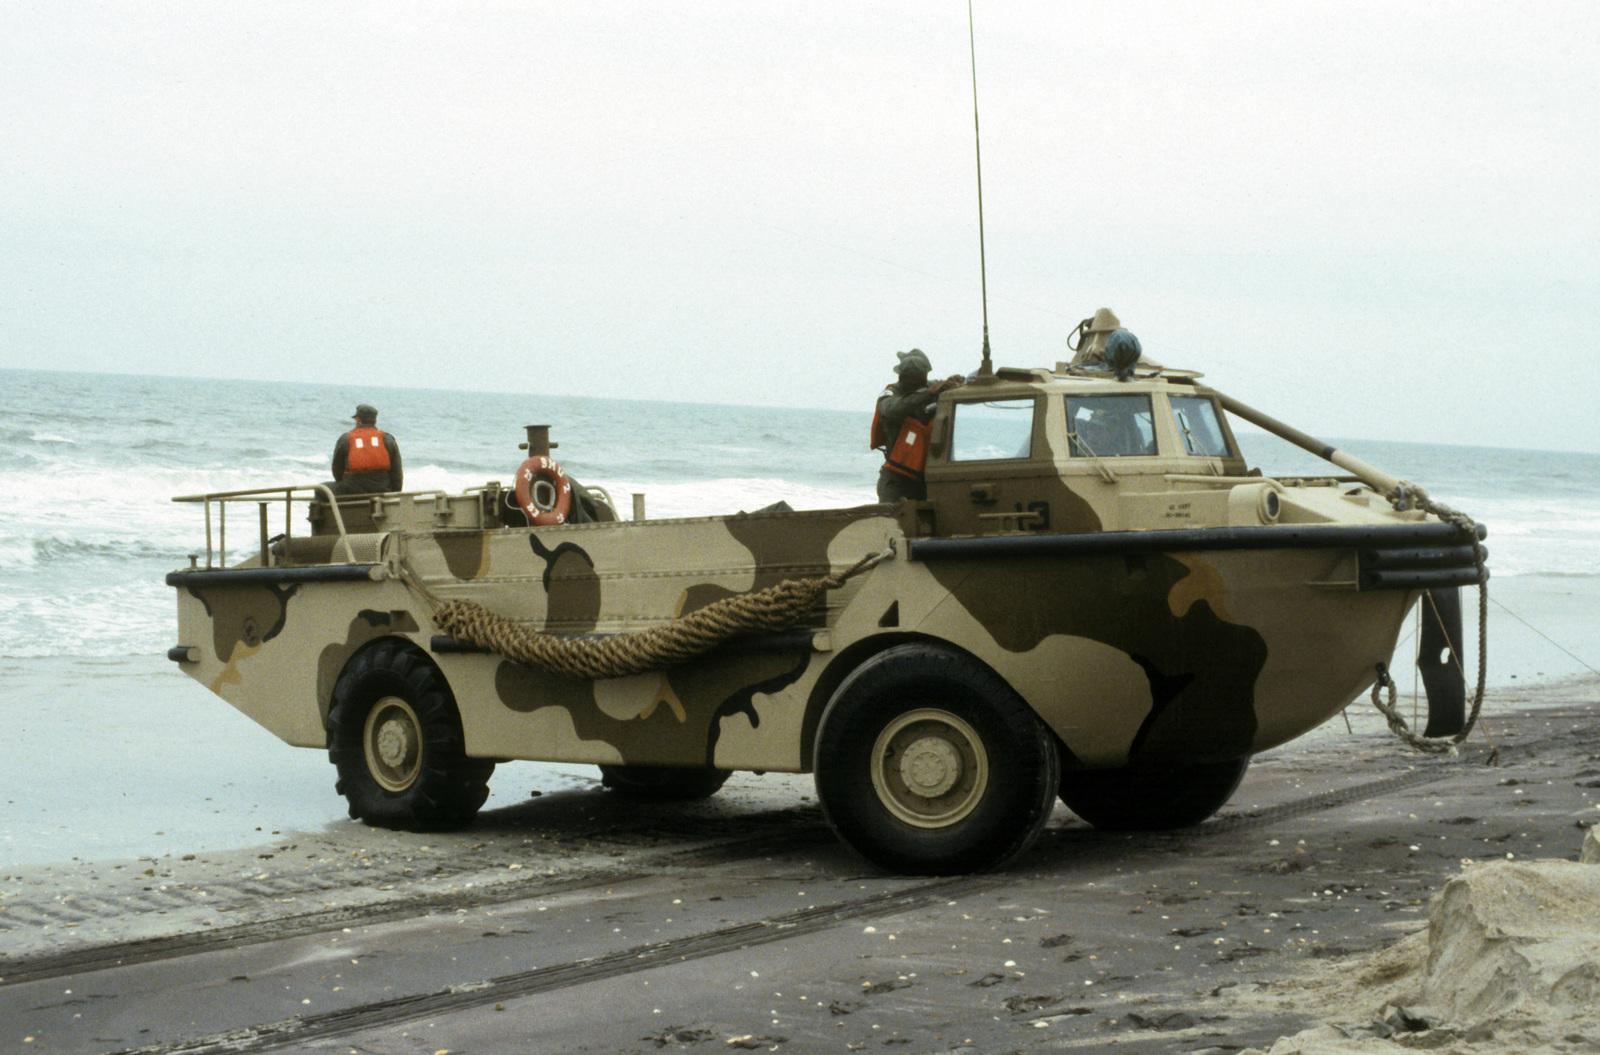 A LARC 5 (Light Amphibious Resupply Cargo) light amphibious cargo